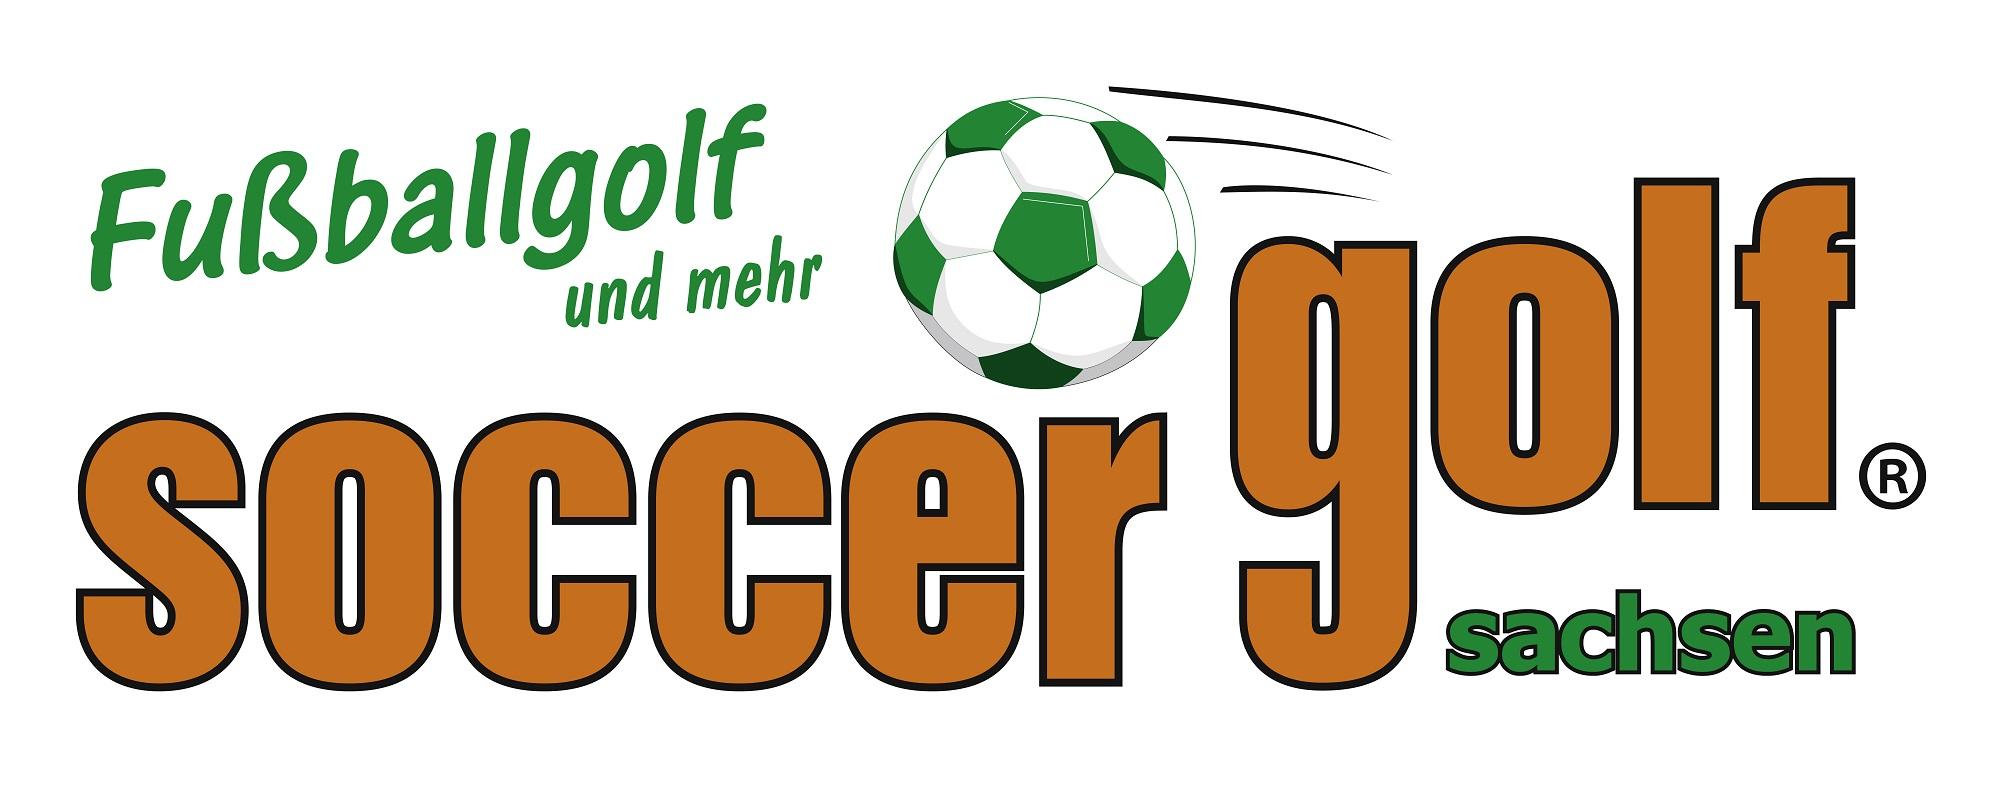 041_Soccergolf Sachsen